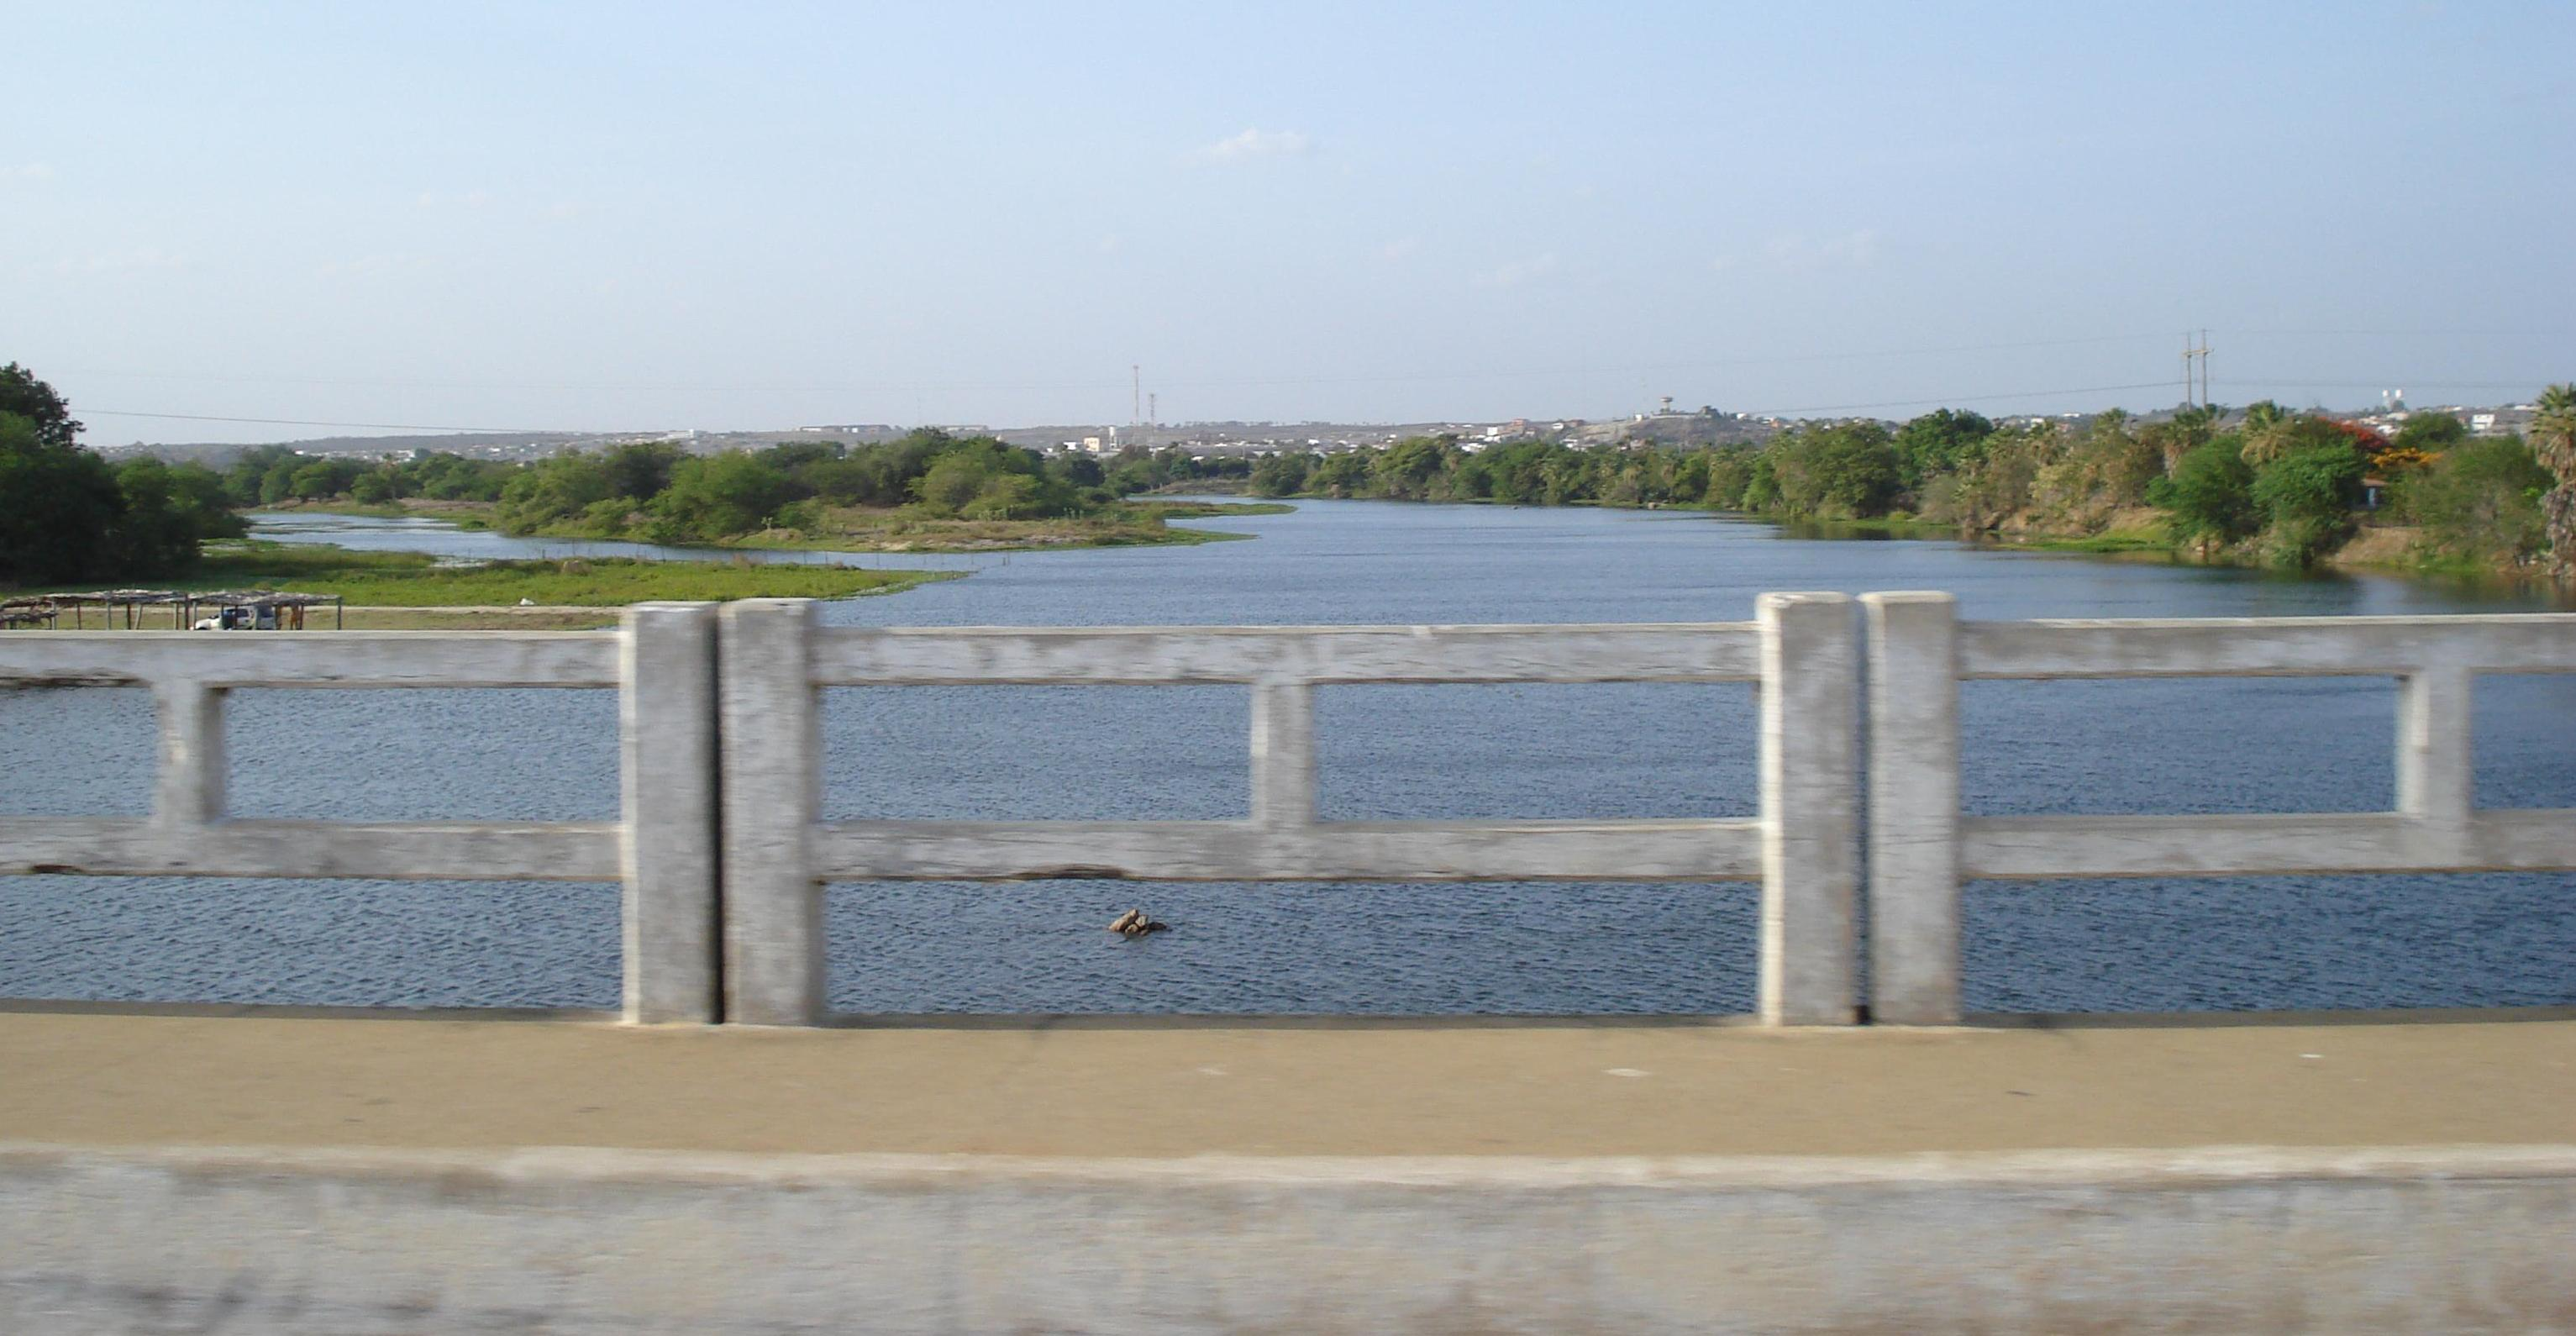 Banabuiú Ceará fonte: upload.wikimedia.org